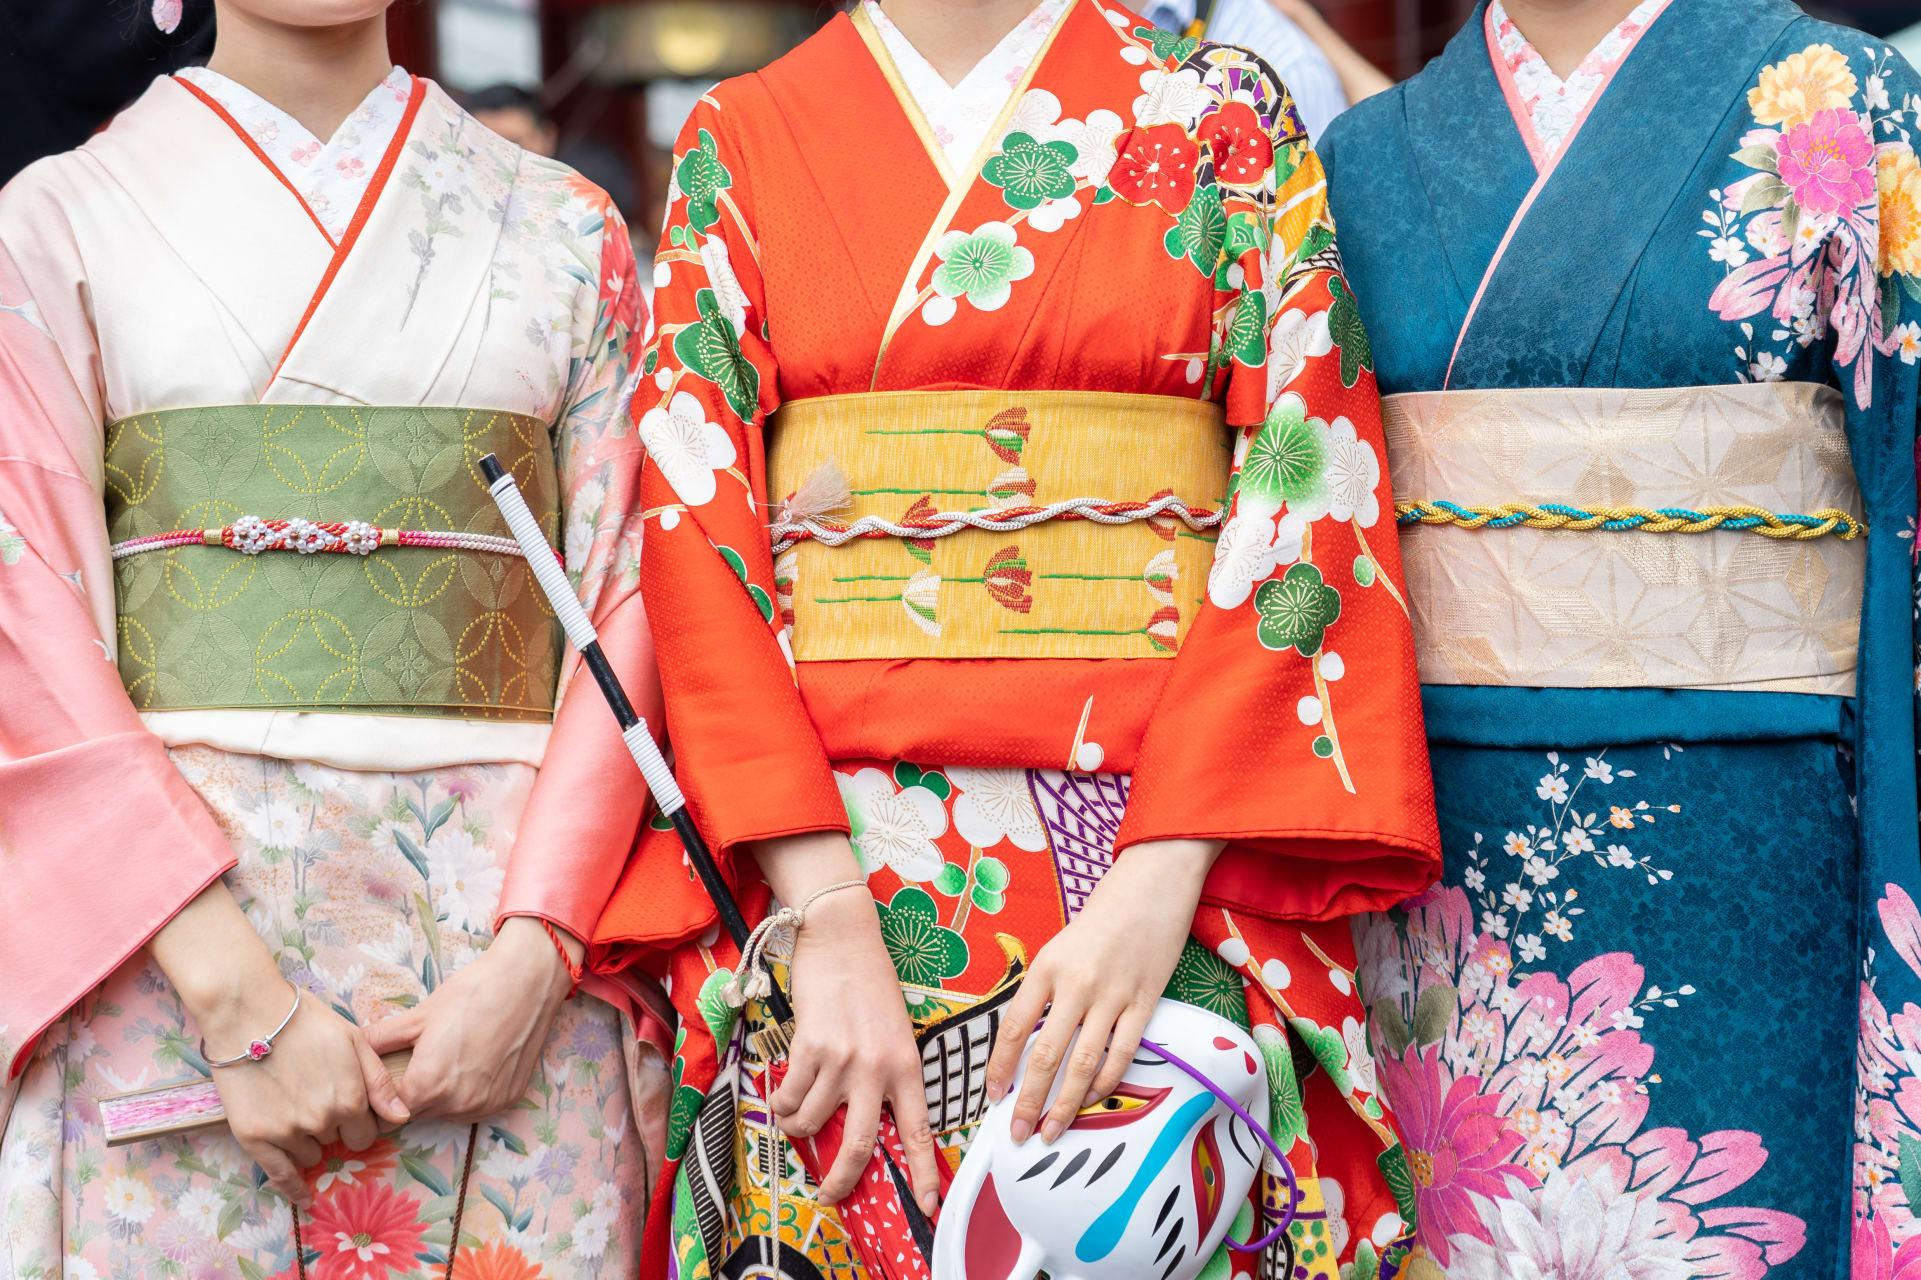 Kyoto - Discover kimono culture, its fabric and patterns at an antique kimono shop